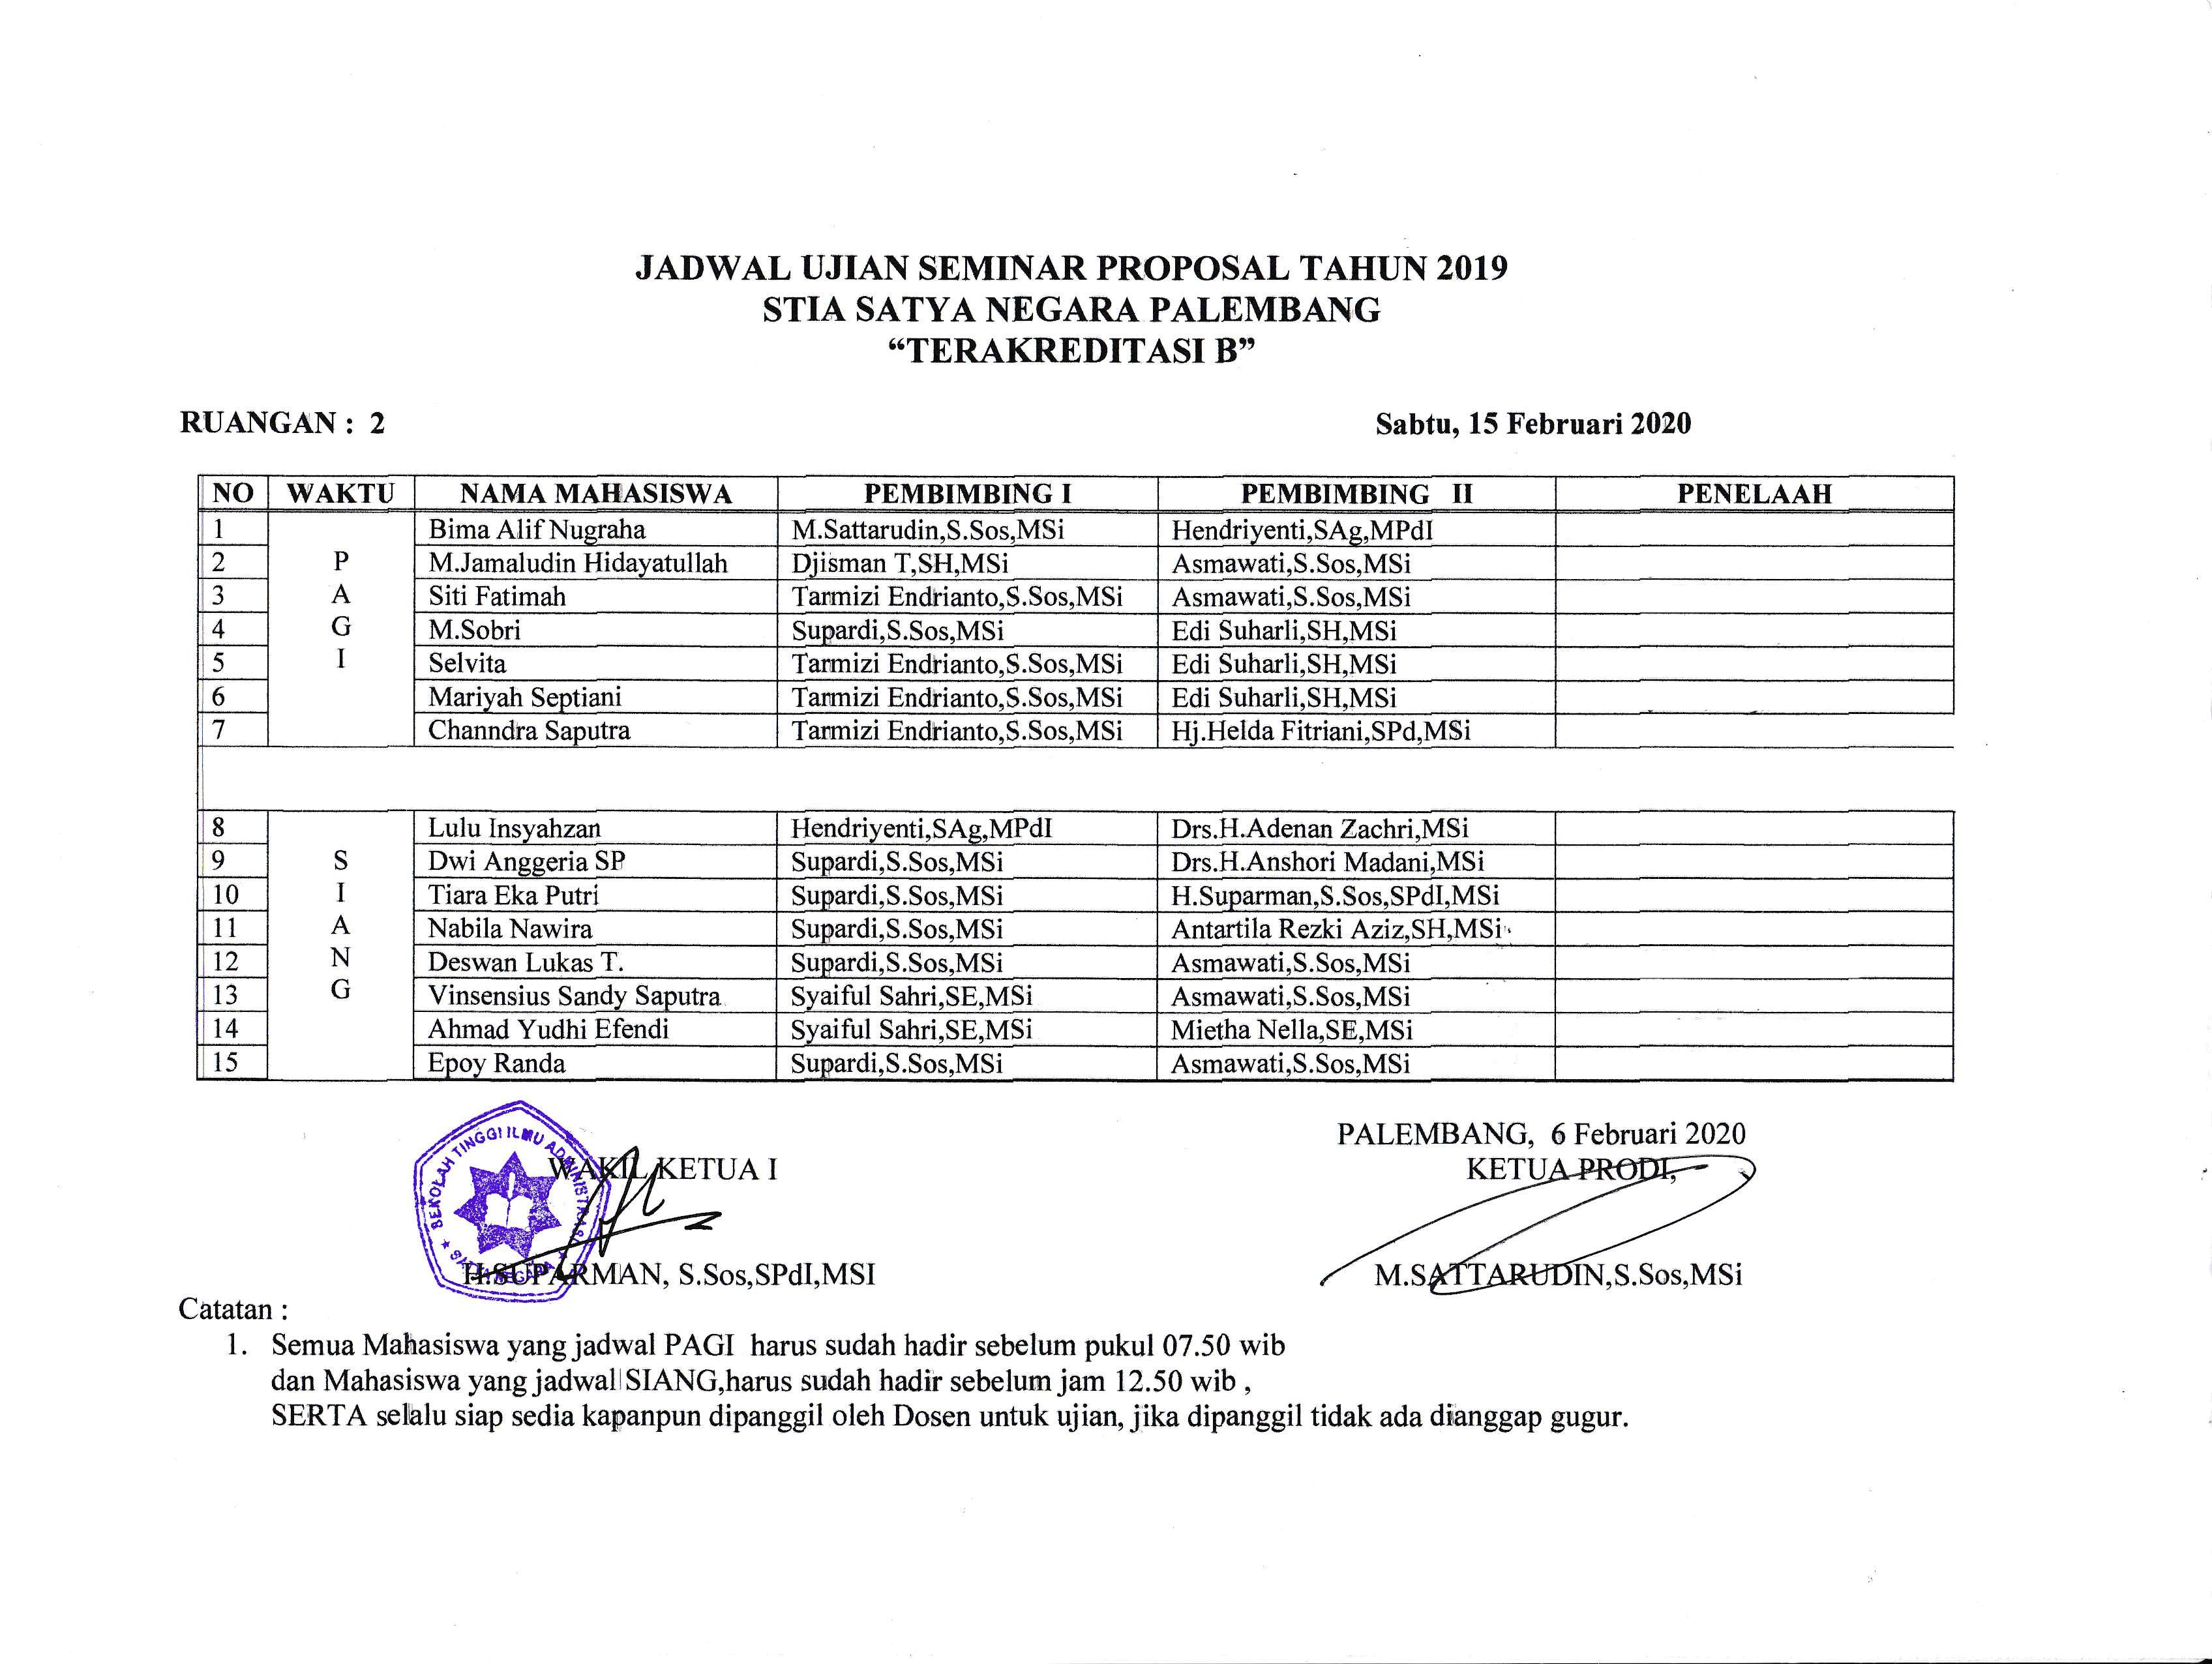 IMG_20200210_0001